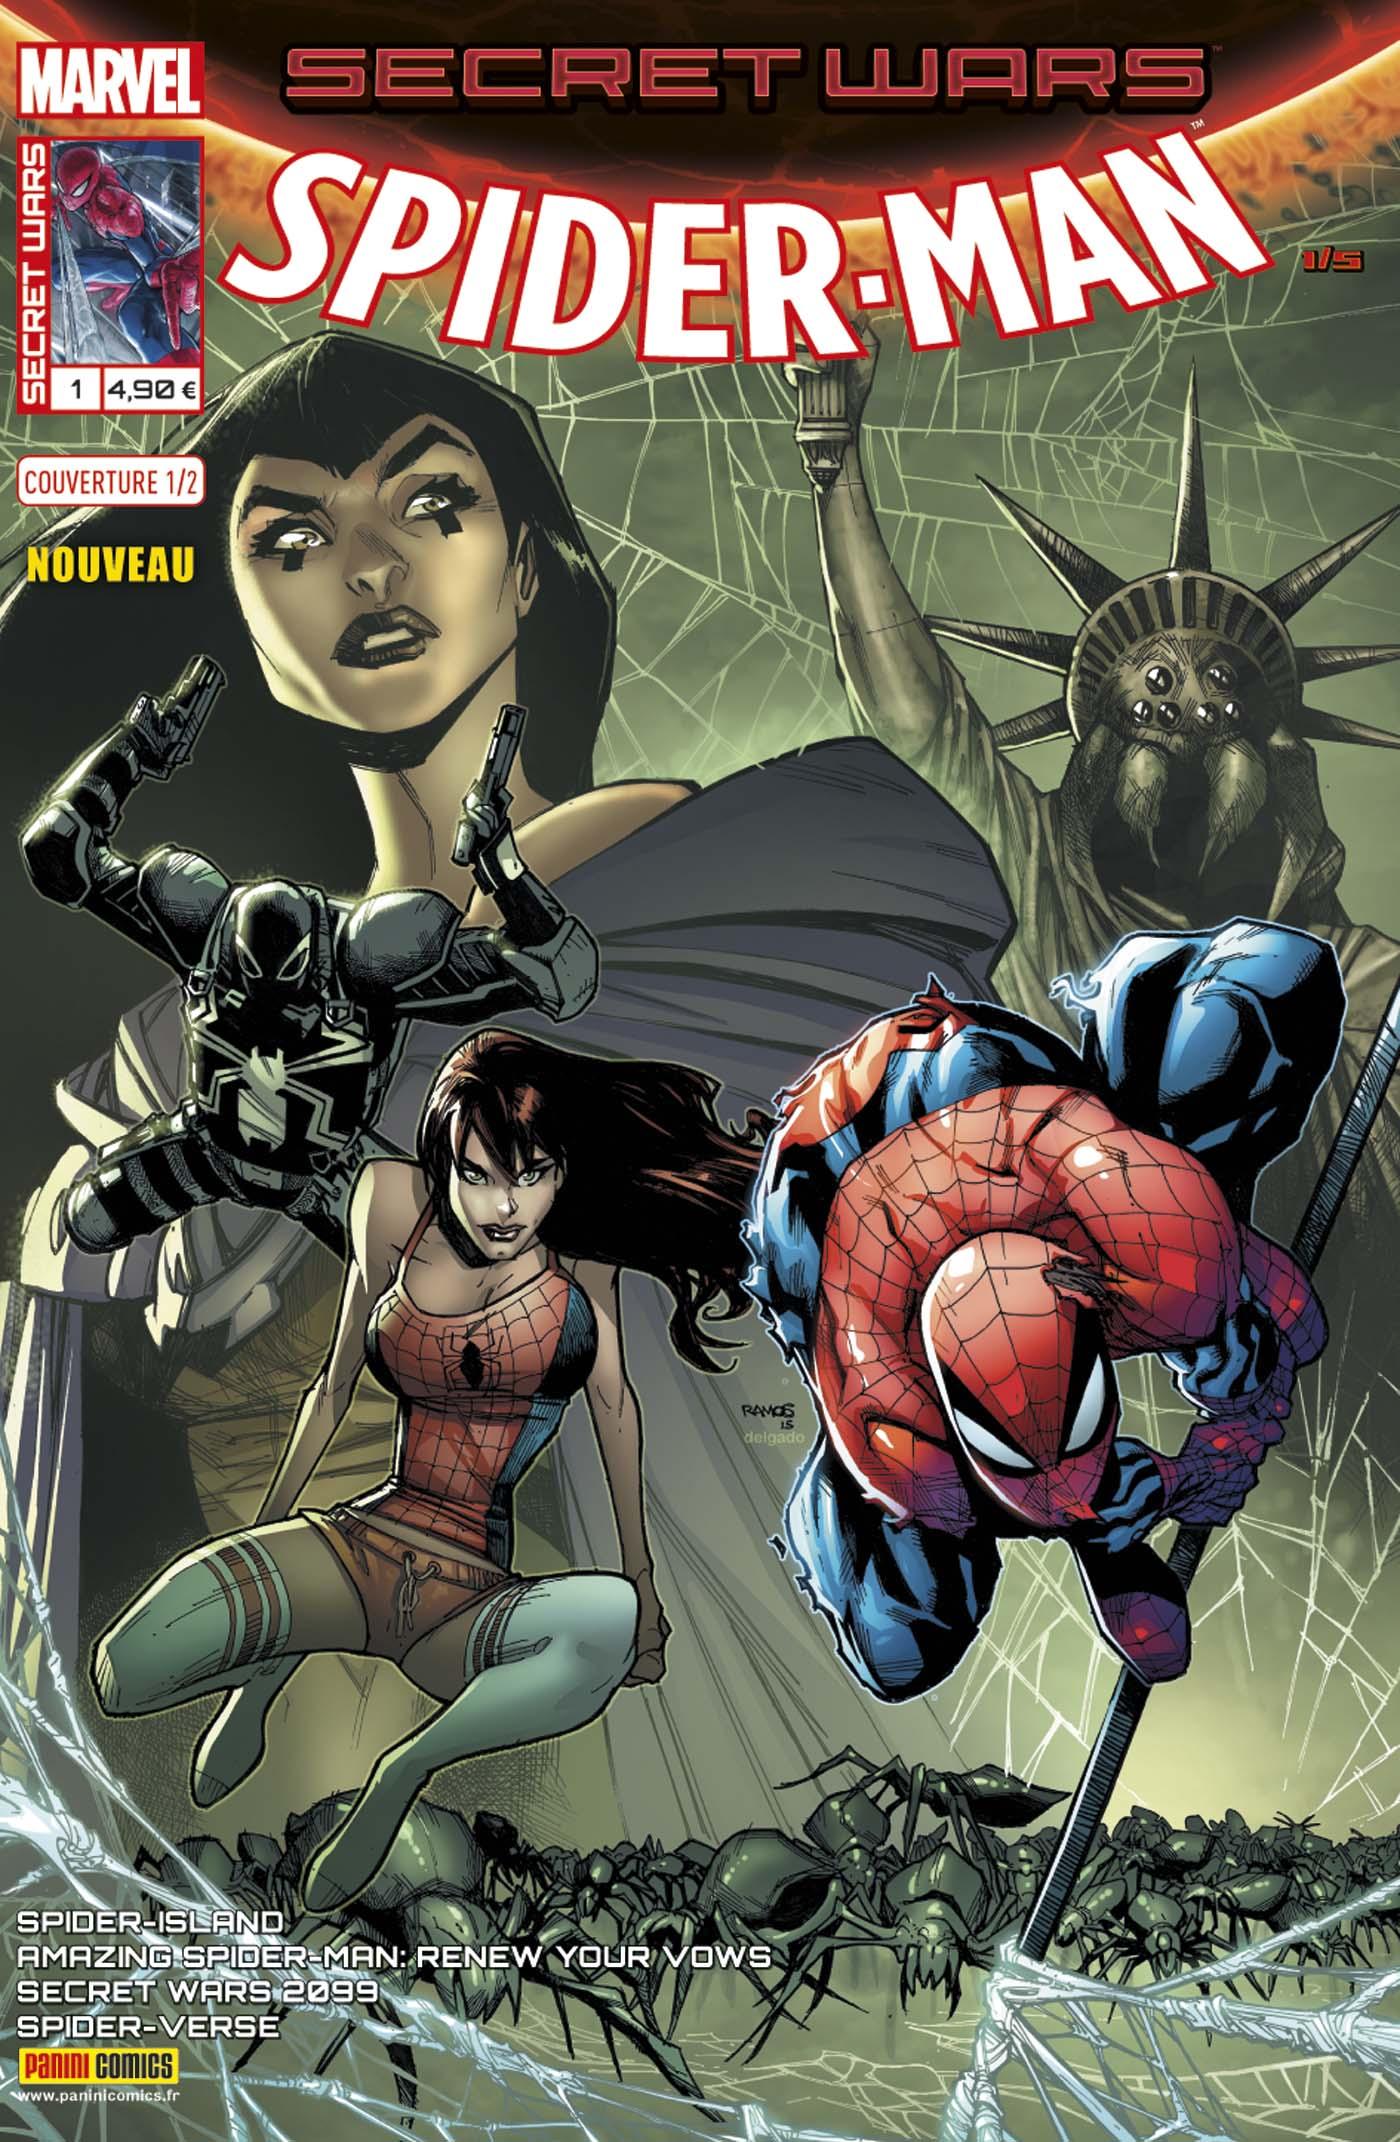 SECRET WARS : SPIDER-MAN 1 (Couv 1/2)